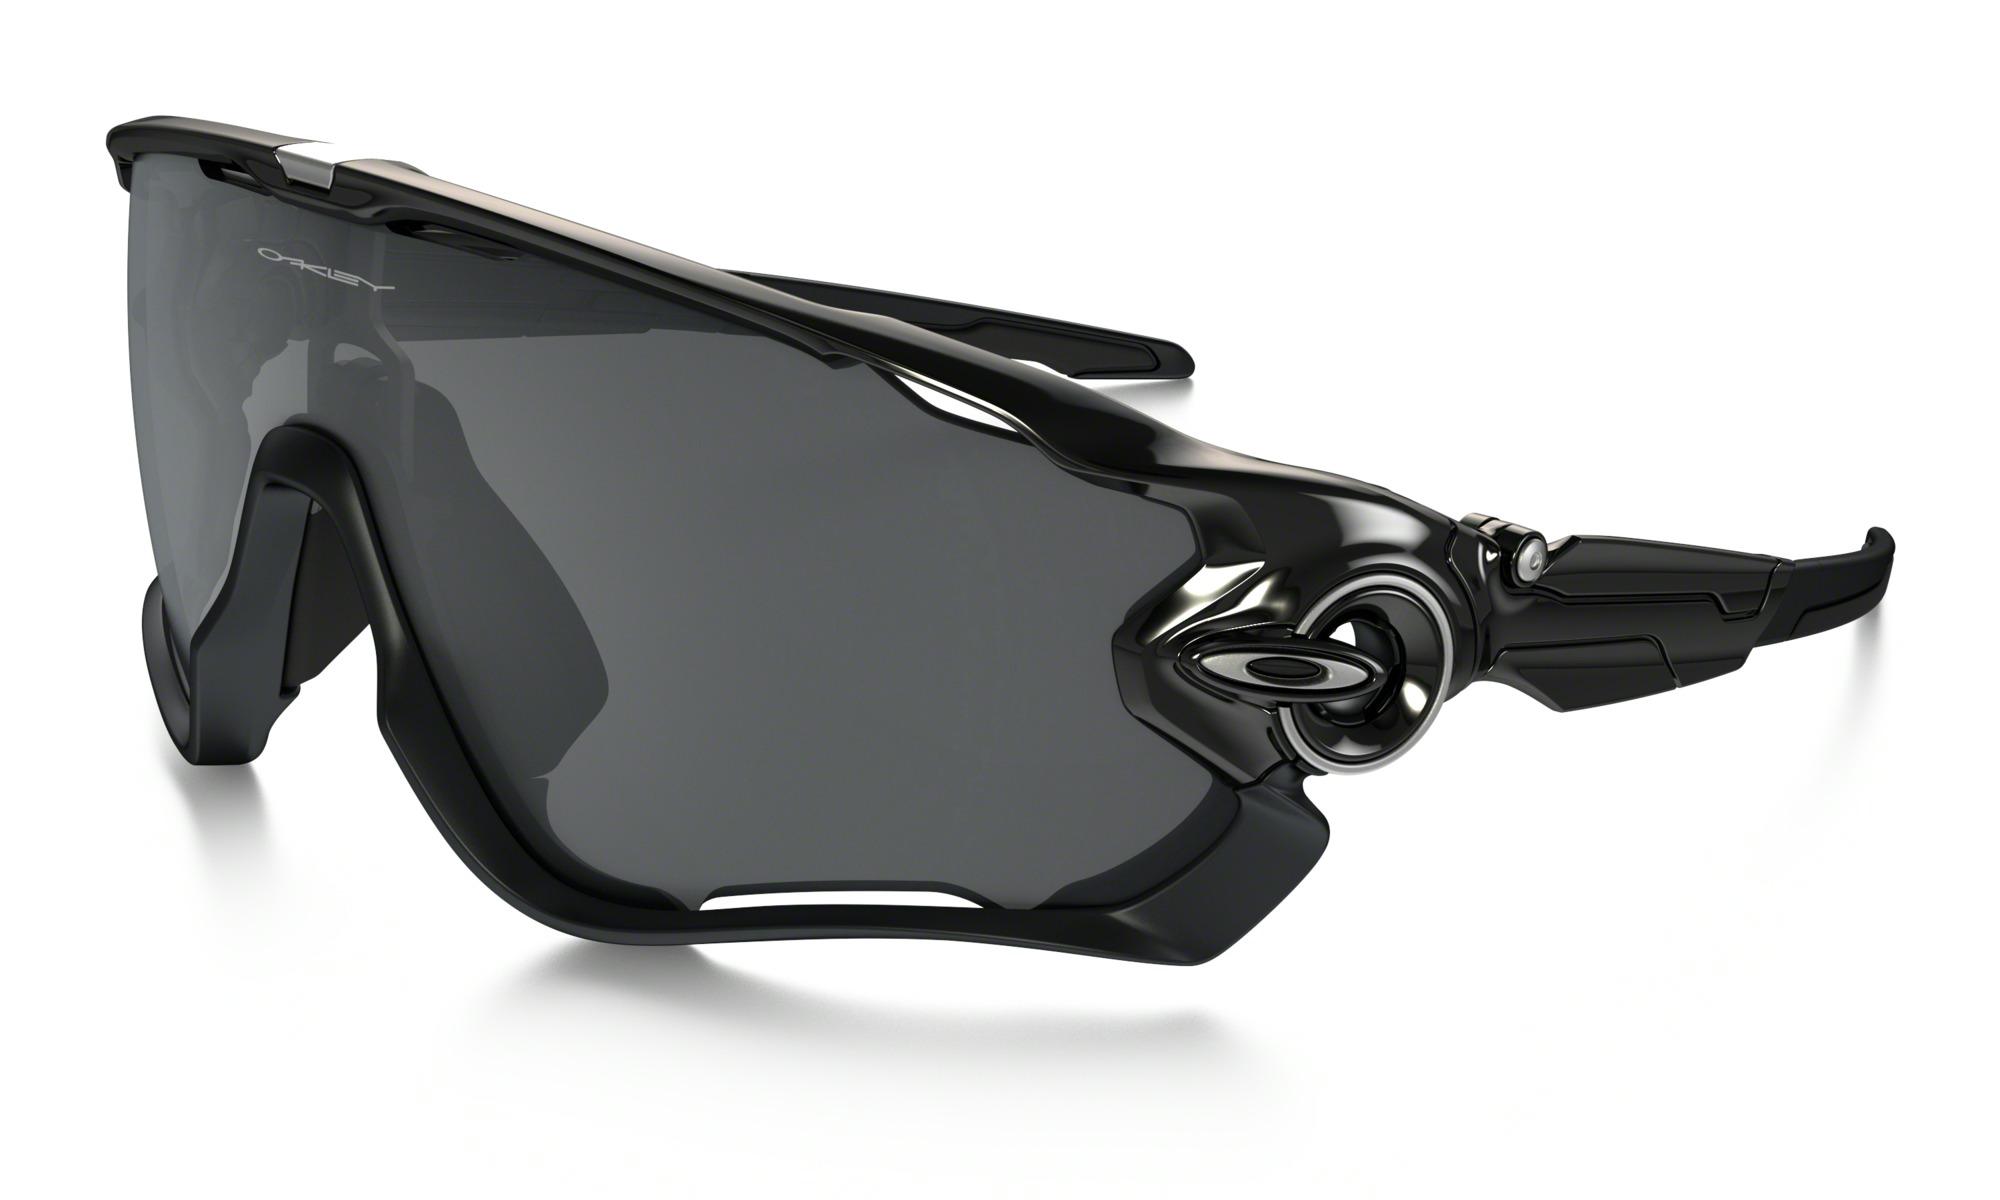 6dd2beba20e Oakley Jawbreaker Sunglasses. Full Screen